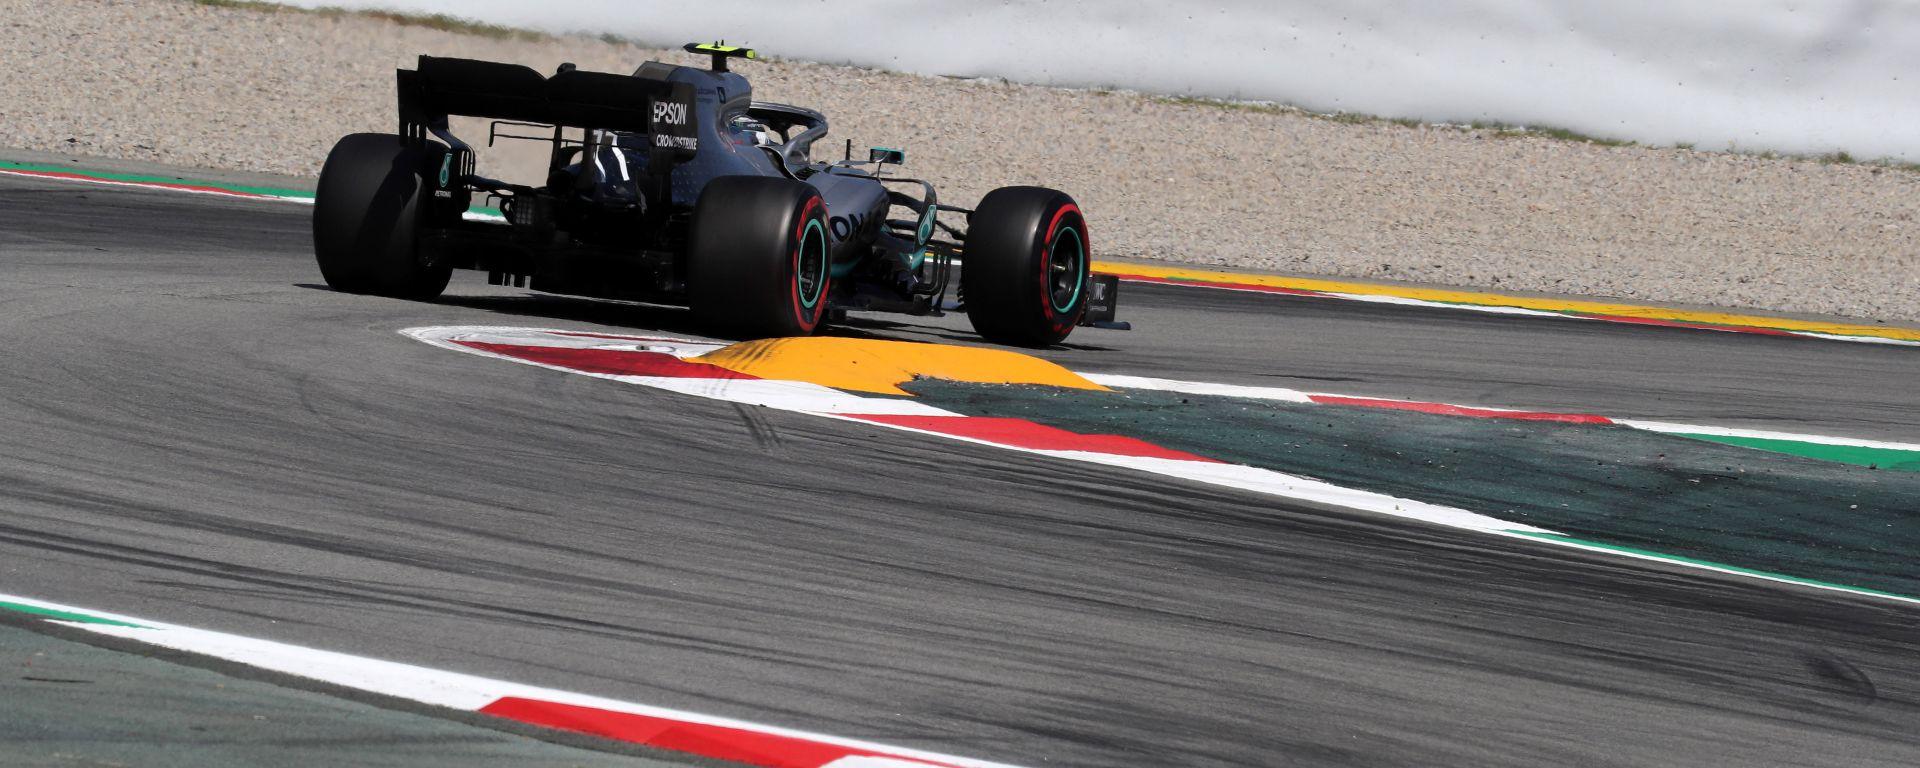 F1 Gp Spagna 2019 – Gara: Dominio Mercedes, Ferrari giù dal podio